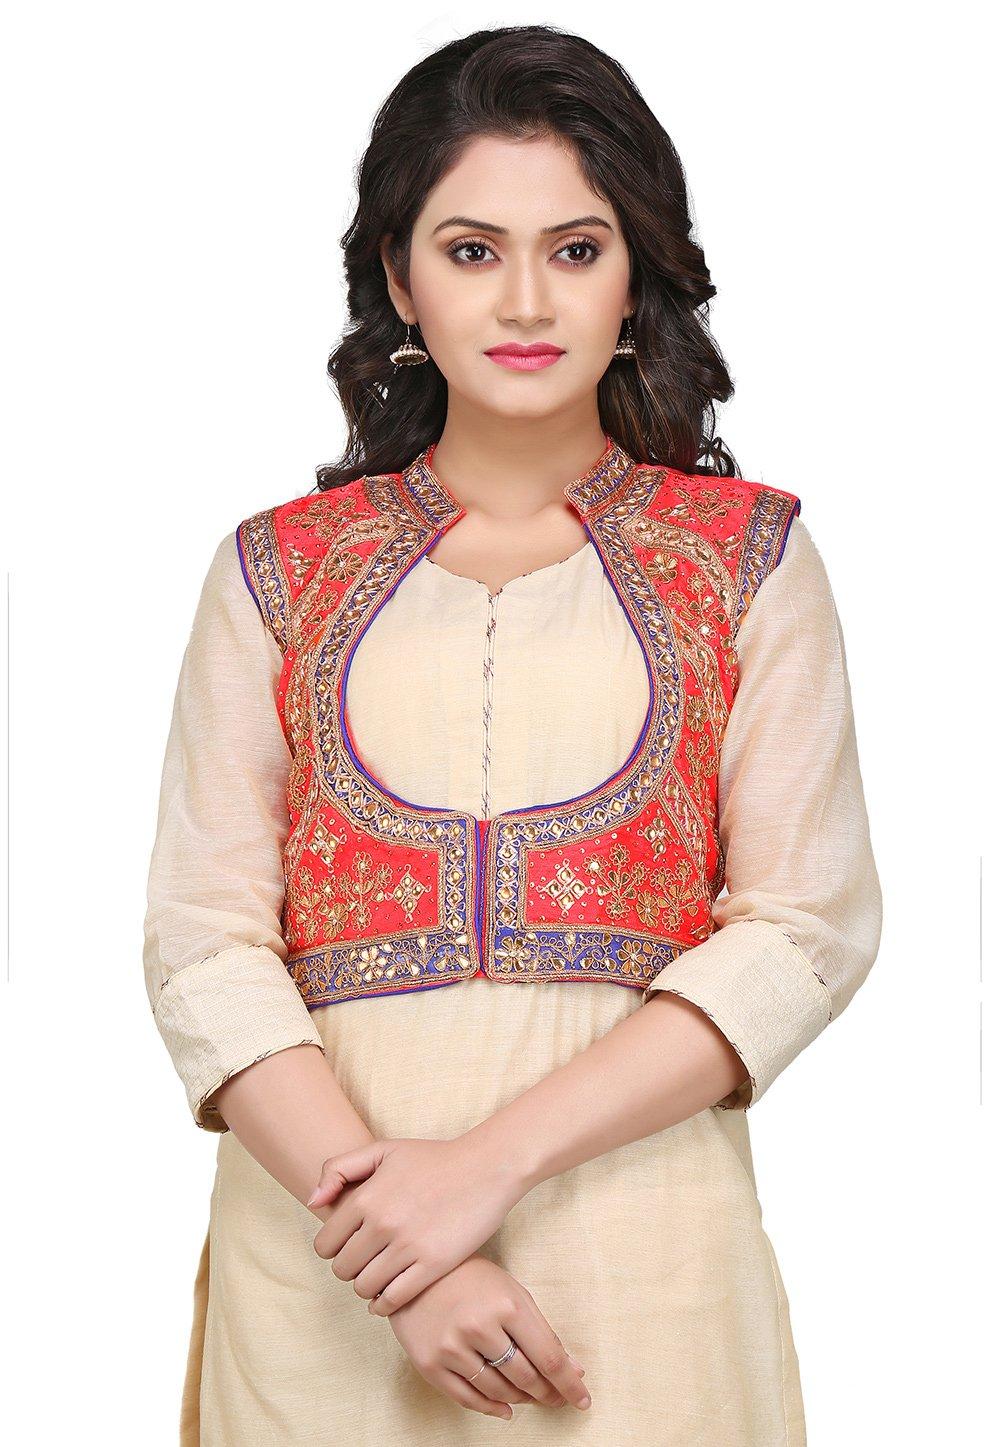 Utsav Fashion Gota Patti Embroidered Dupion Silk Jacket in Coral Red by Utsav Fashion